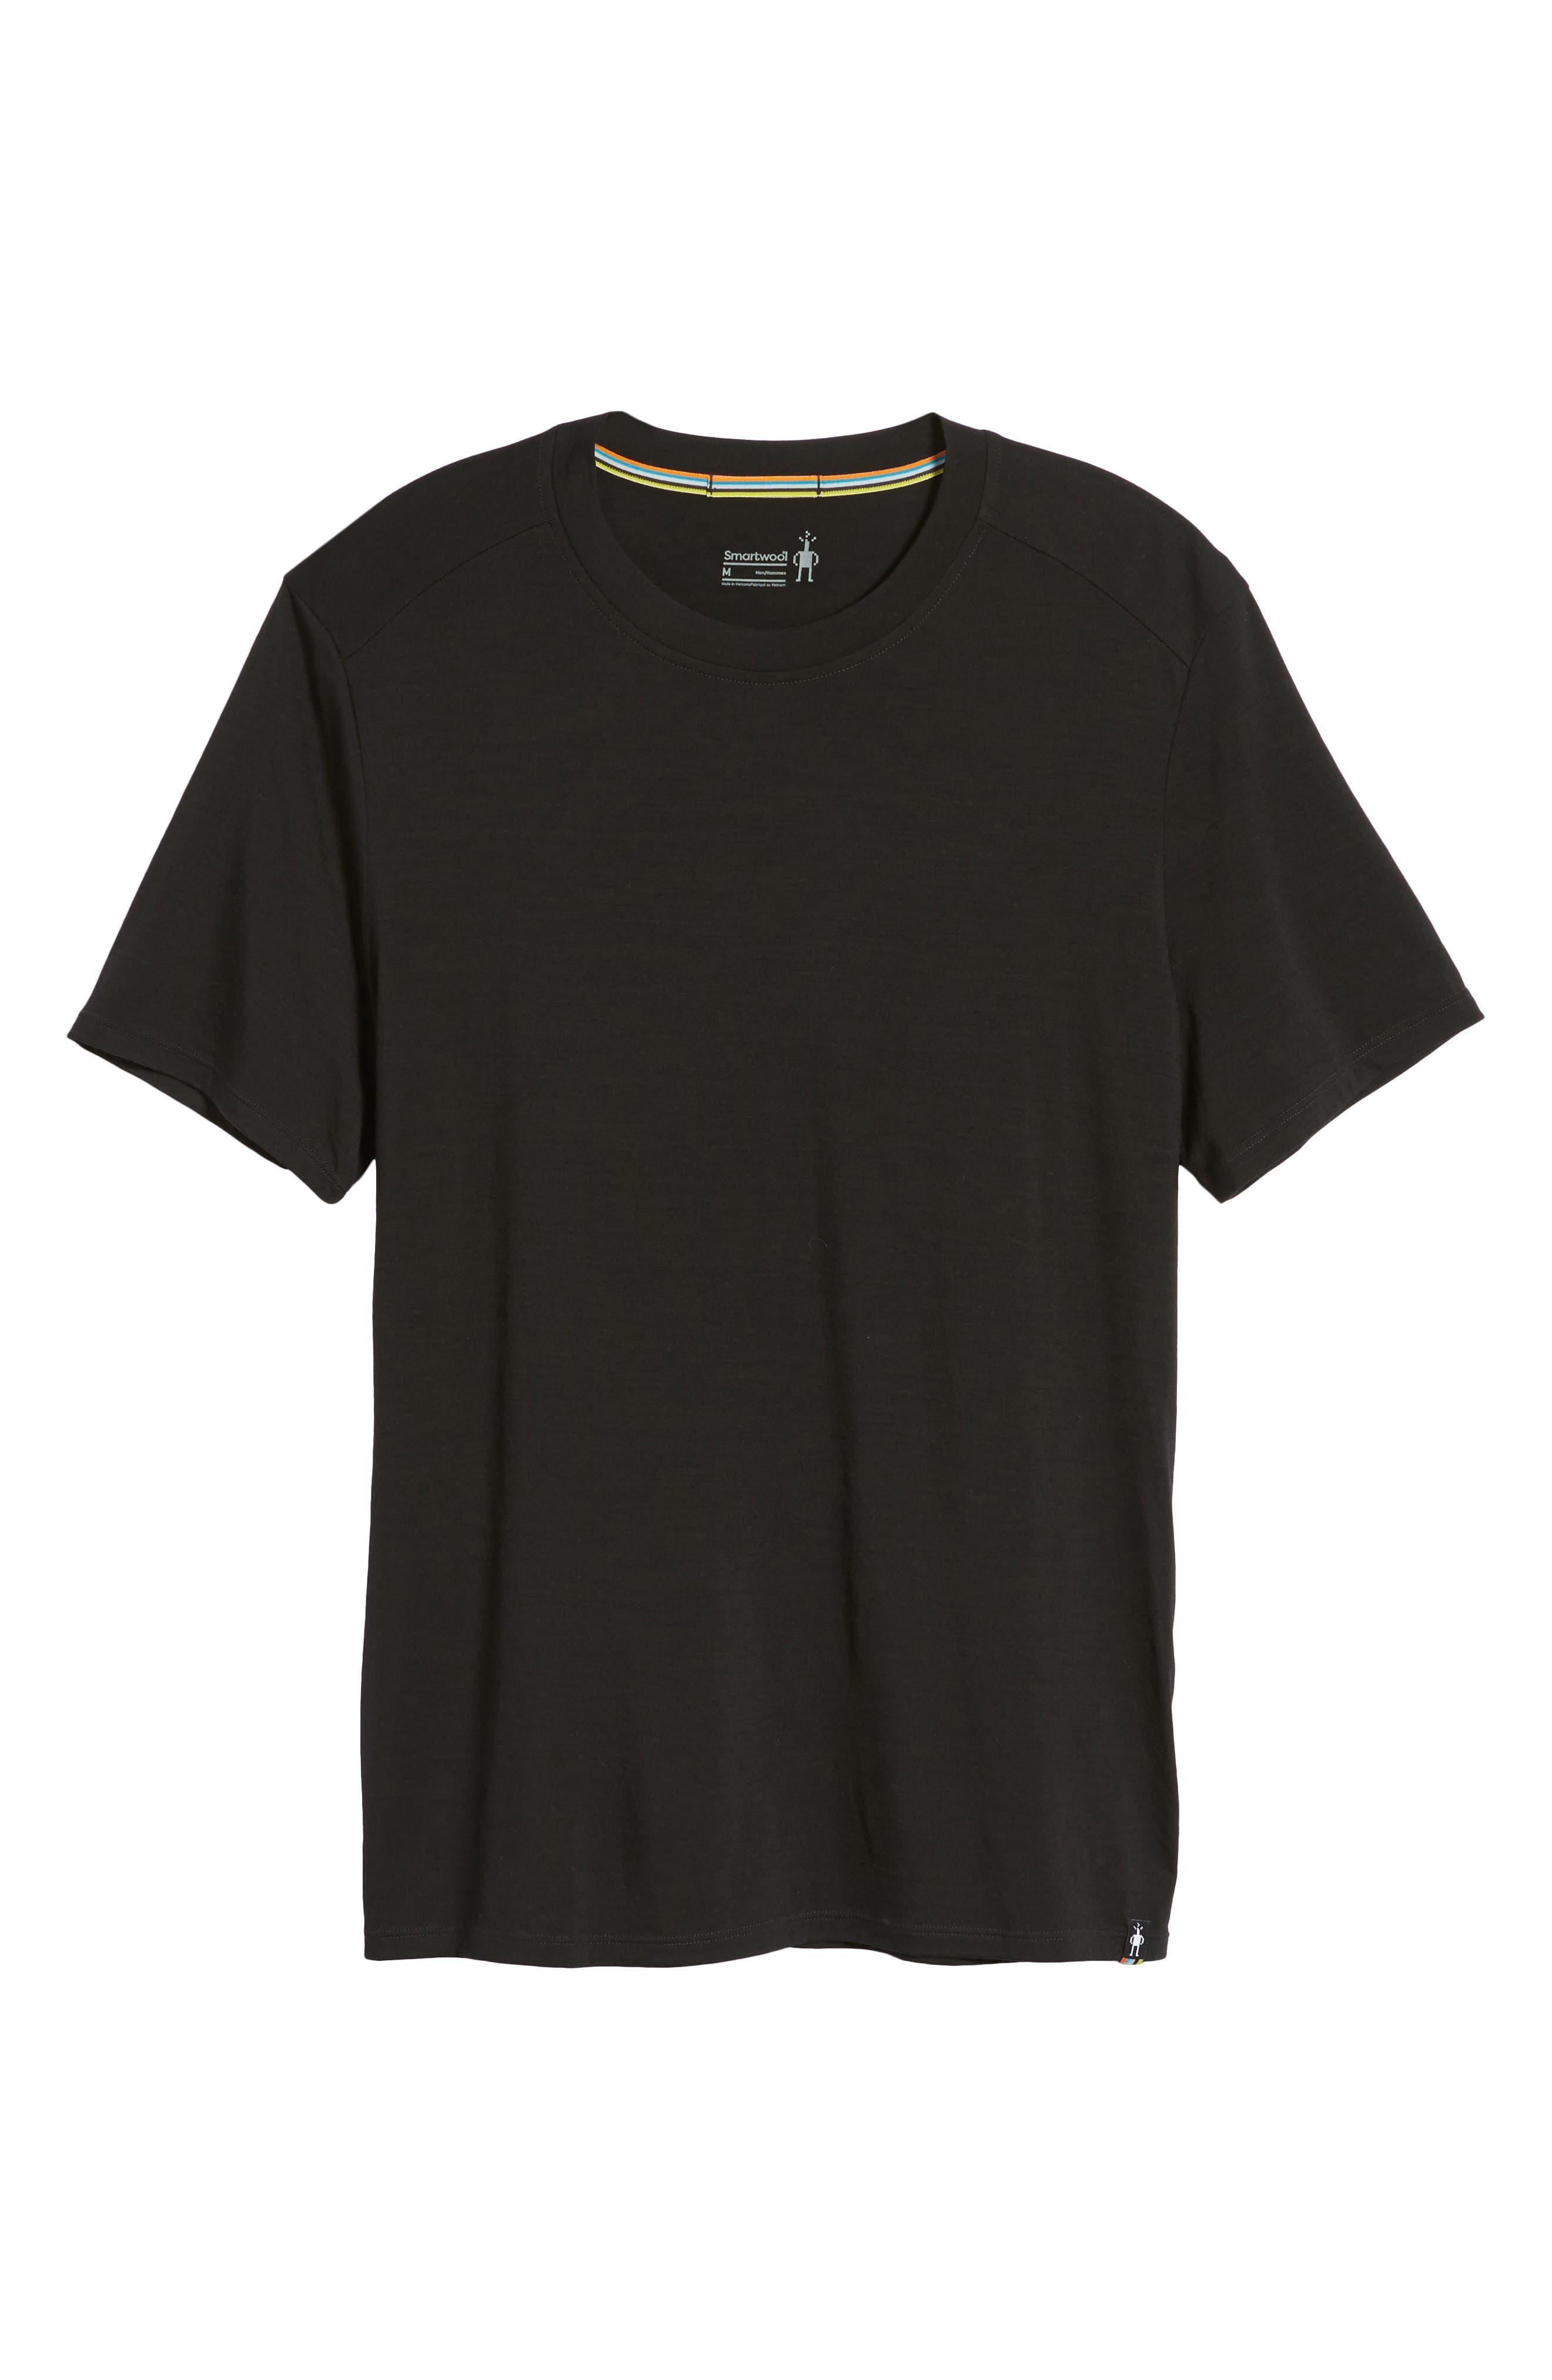 Merino 150 Wool Blend T-Shirt,                             Alternate thumbnail 6, color,                             001